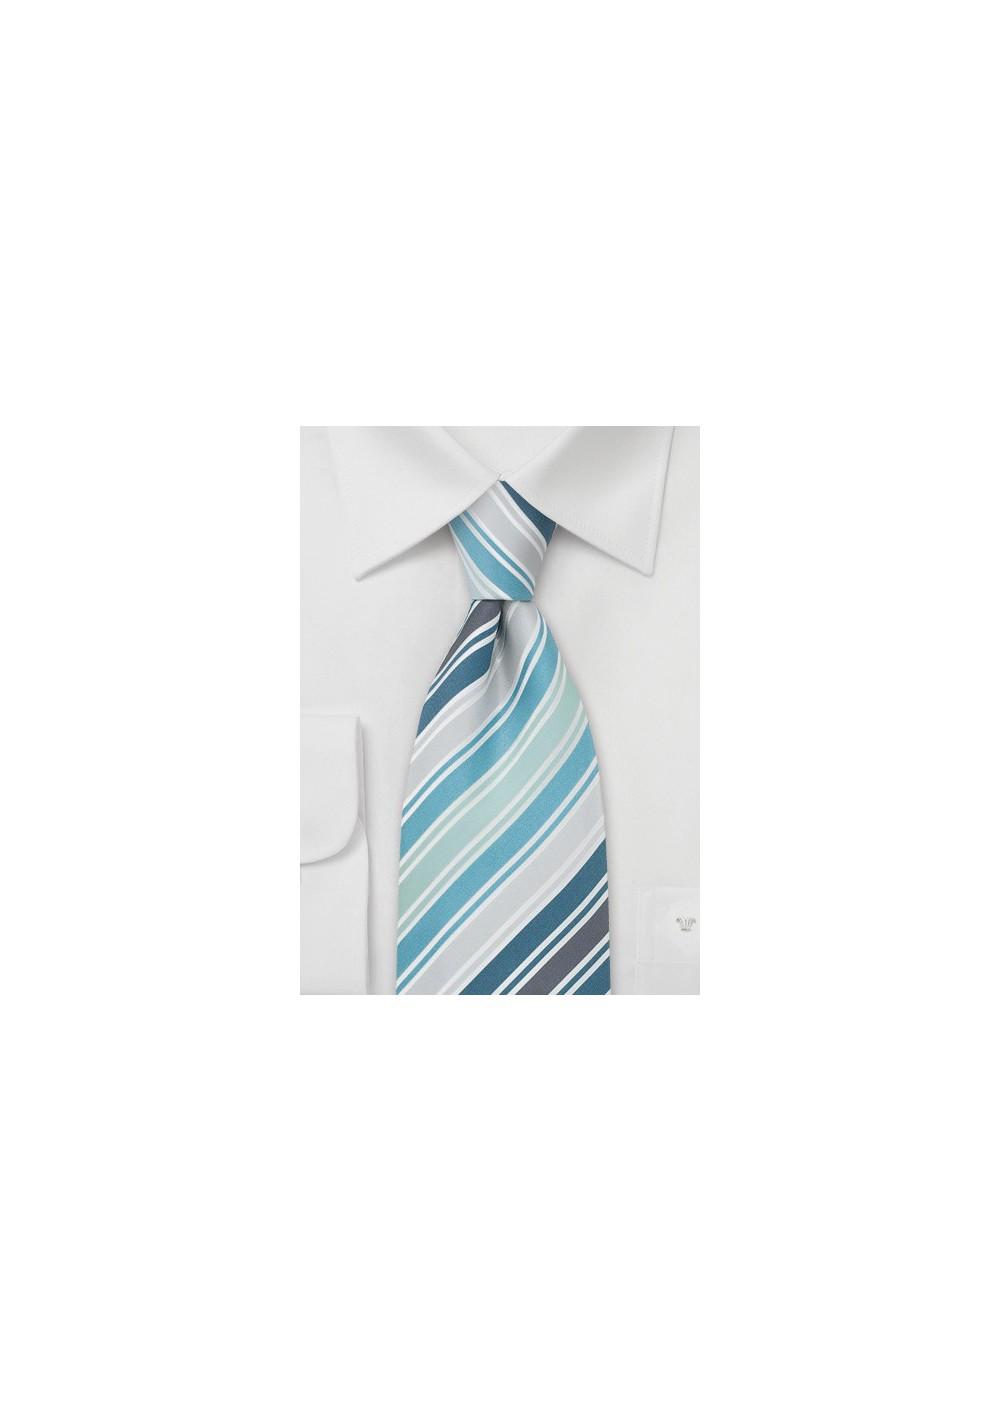 Mens Silk Tie by Cavallieri in Turquoise, Teal, Silver